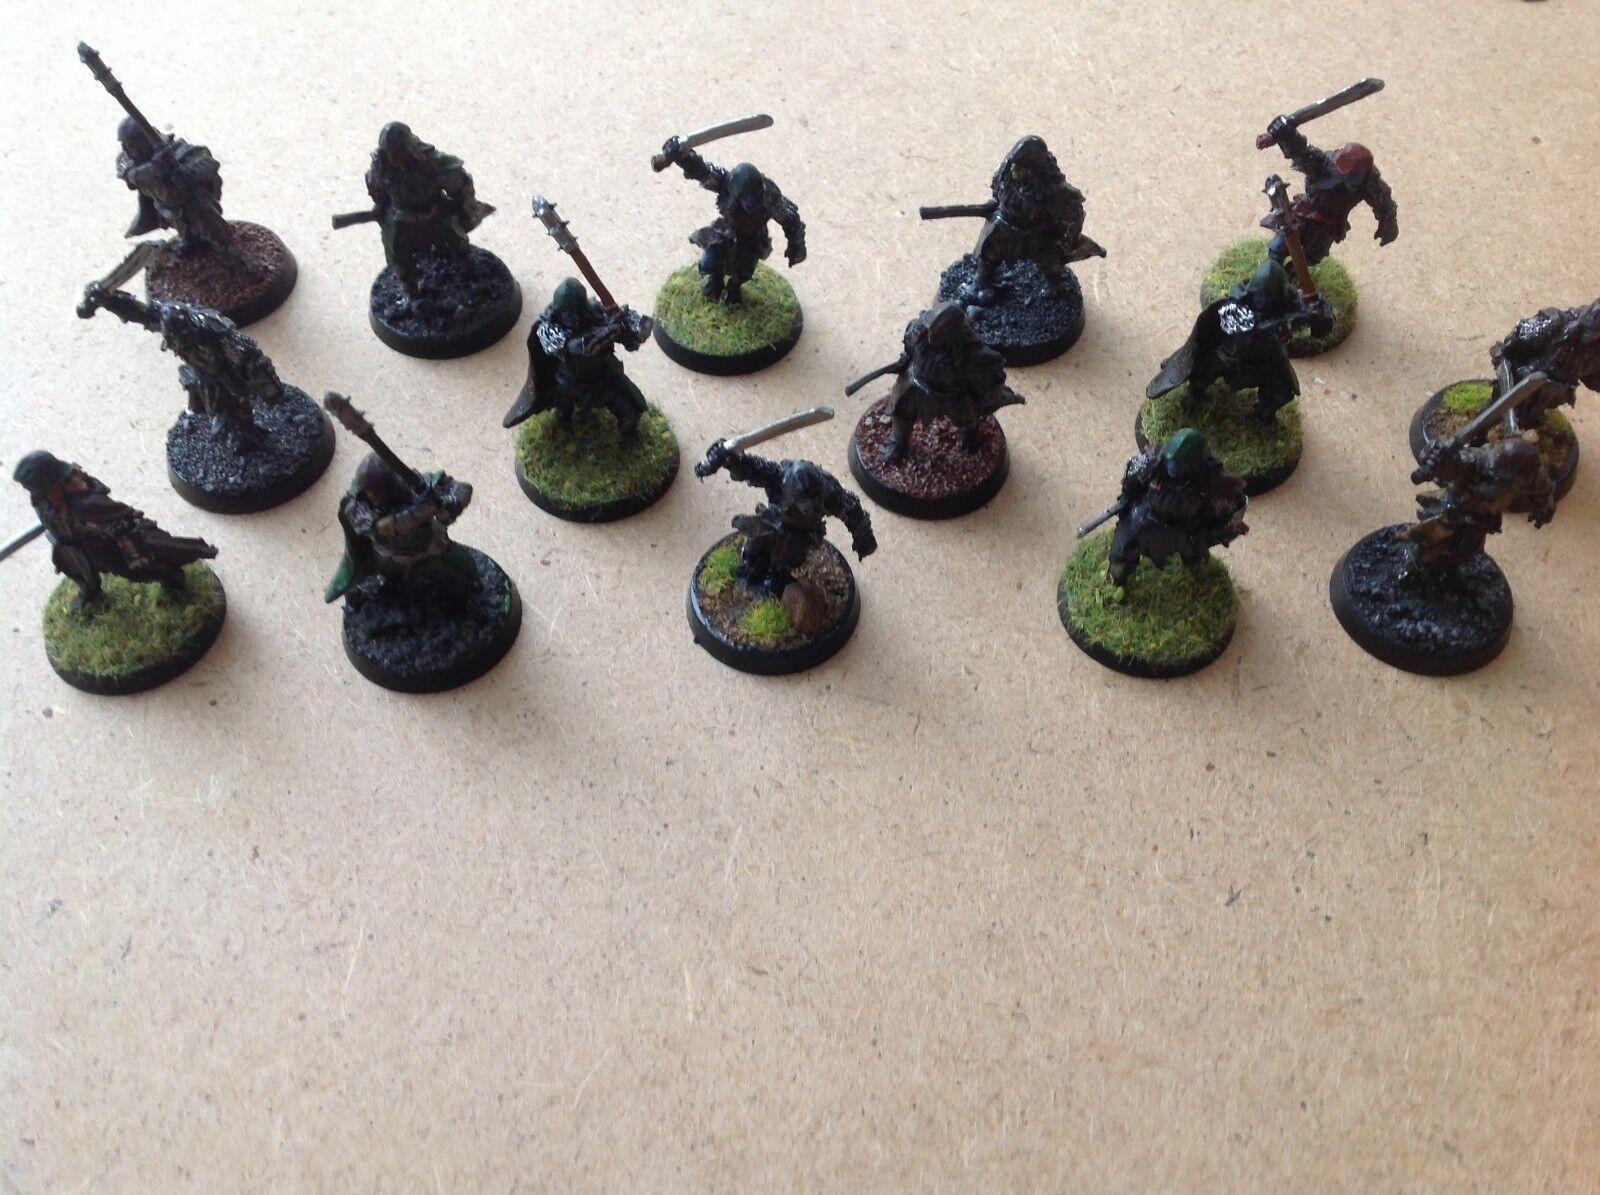 LOTR 15 Metal Painted Mordor Urak Hai from Cirith Ungul